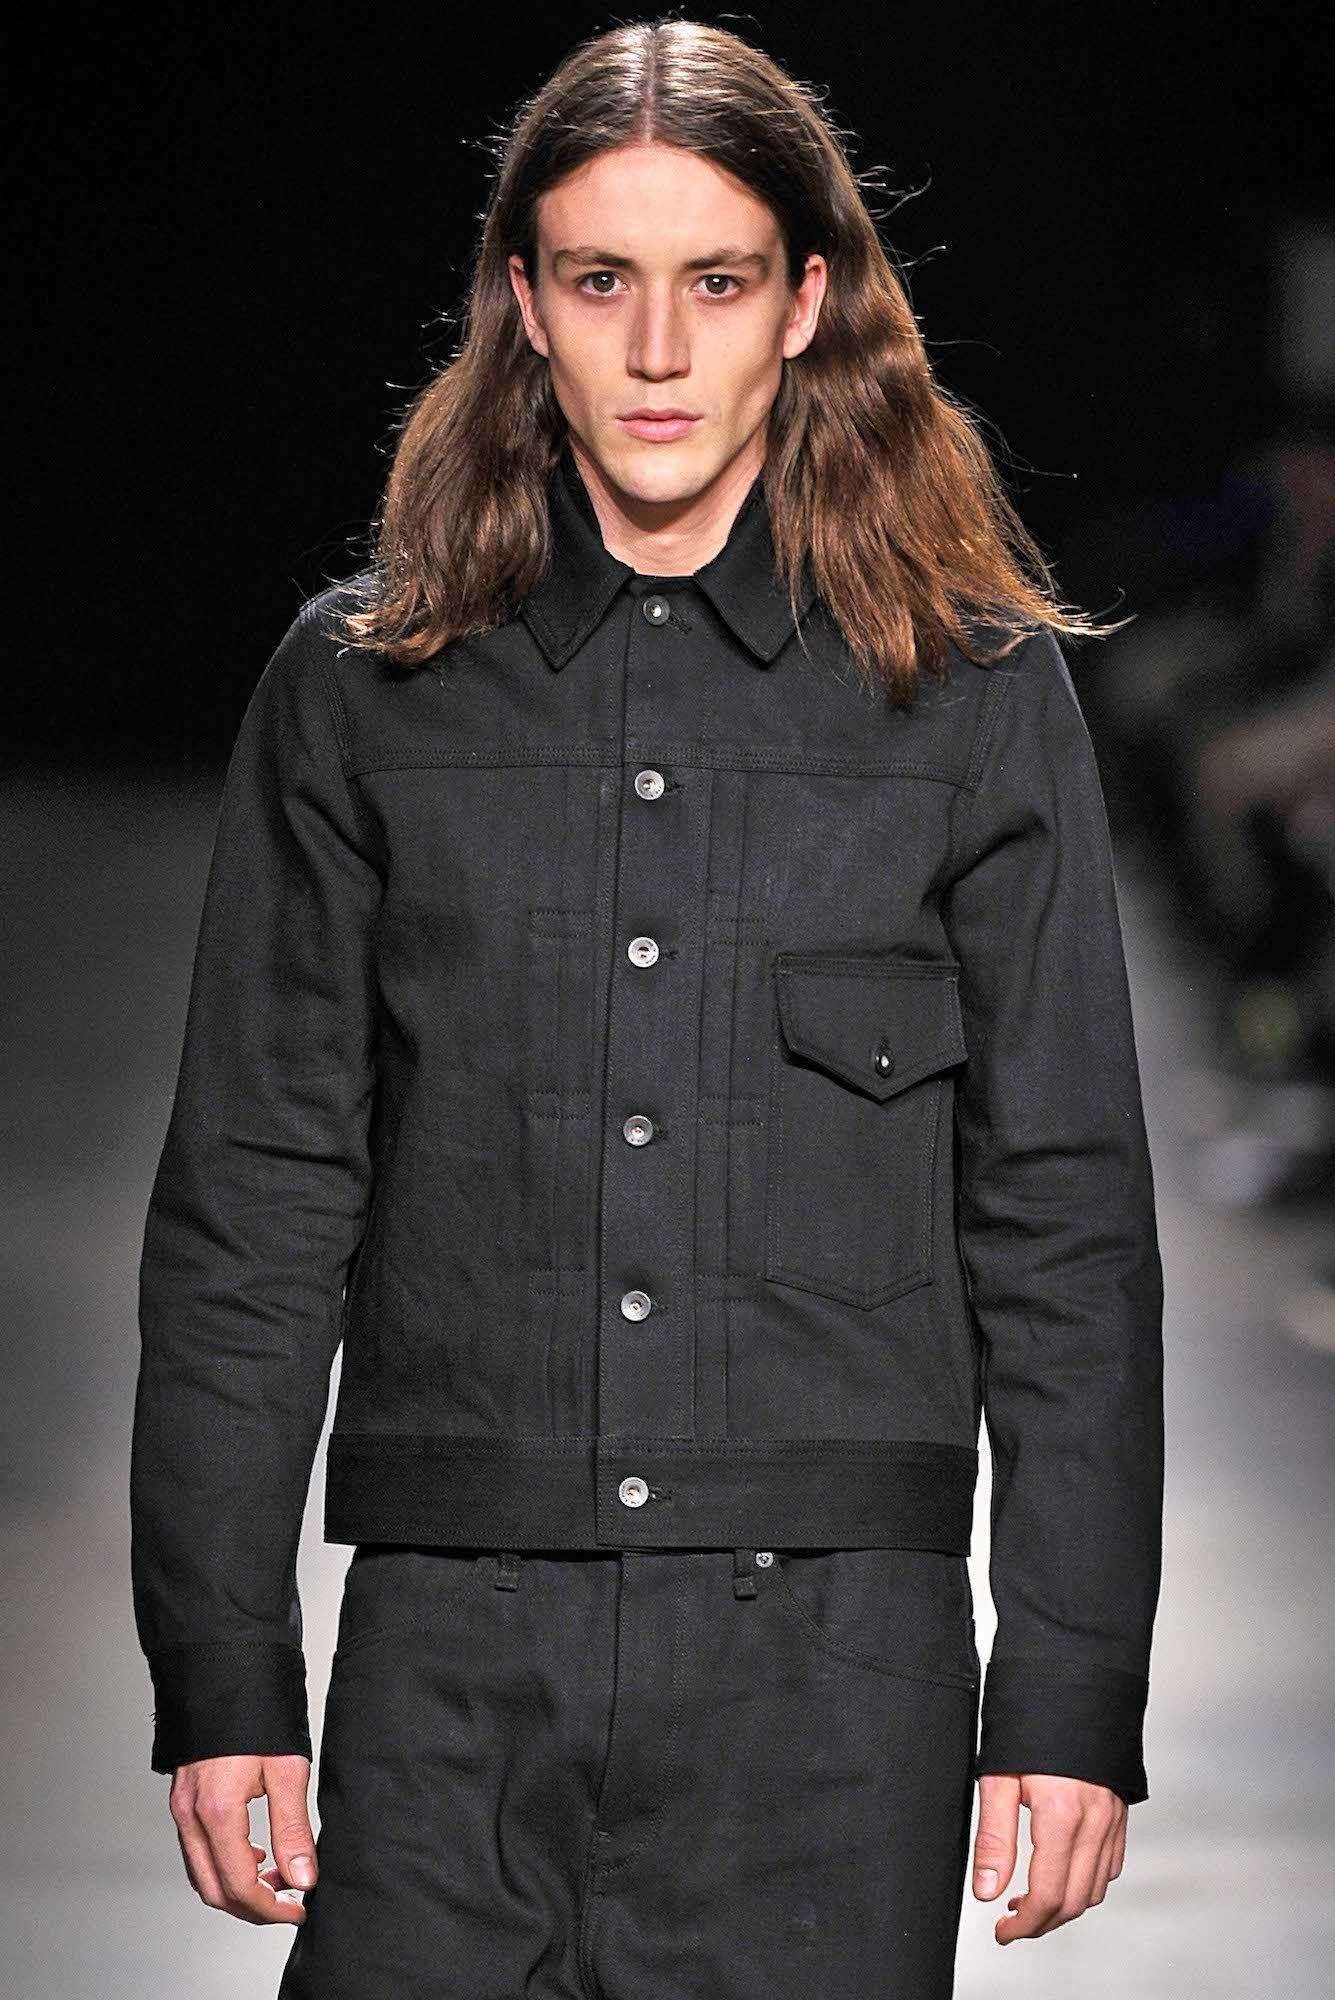 Model rambut wavy pada rambut pria